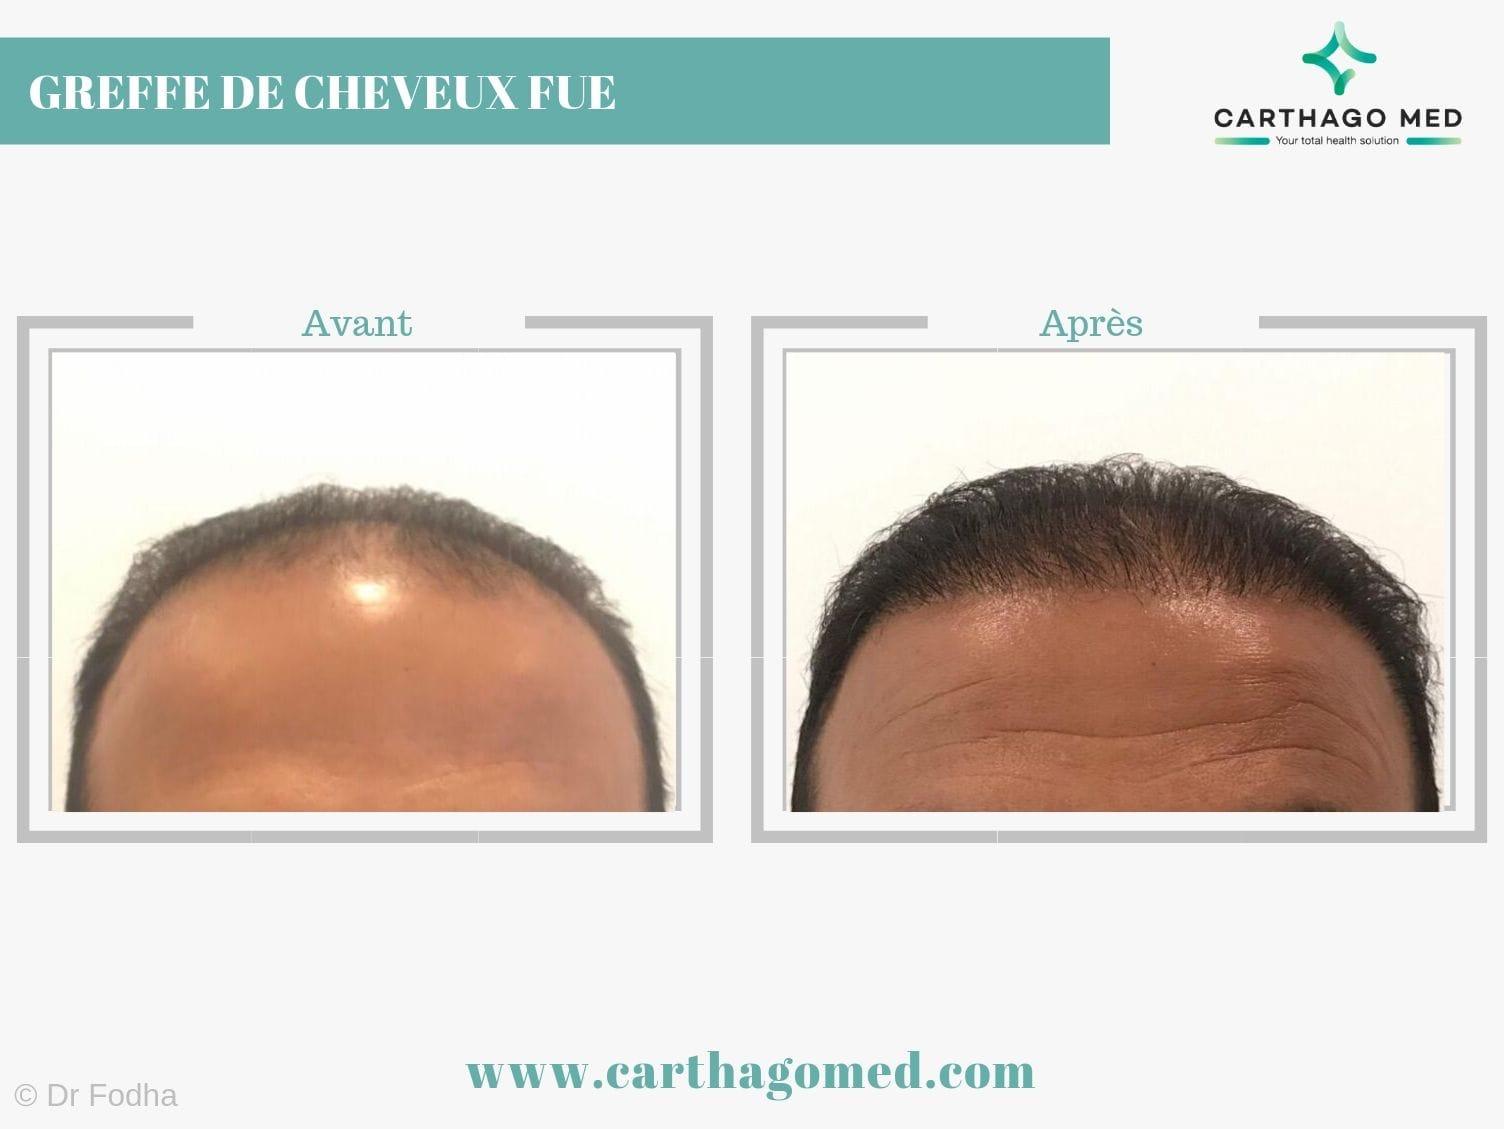 Greffe de cheveux 1 Carthago Med-min (2)